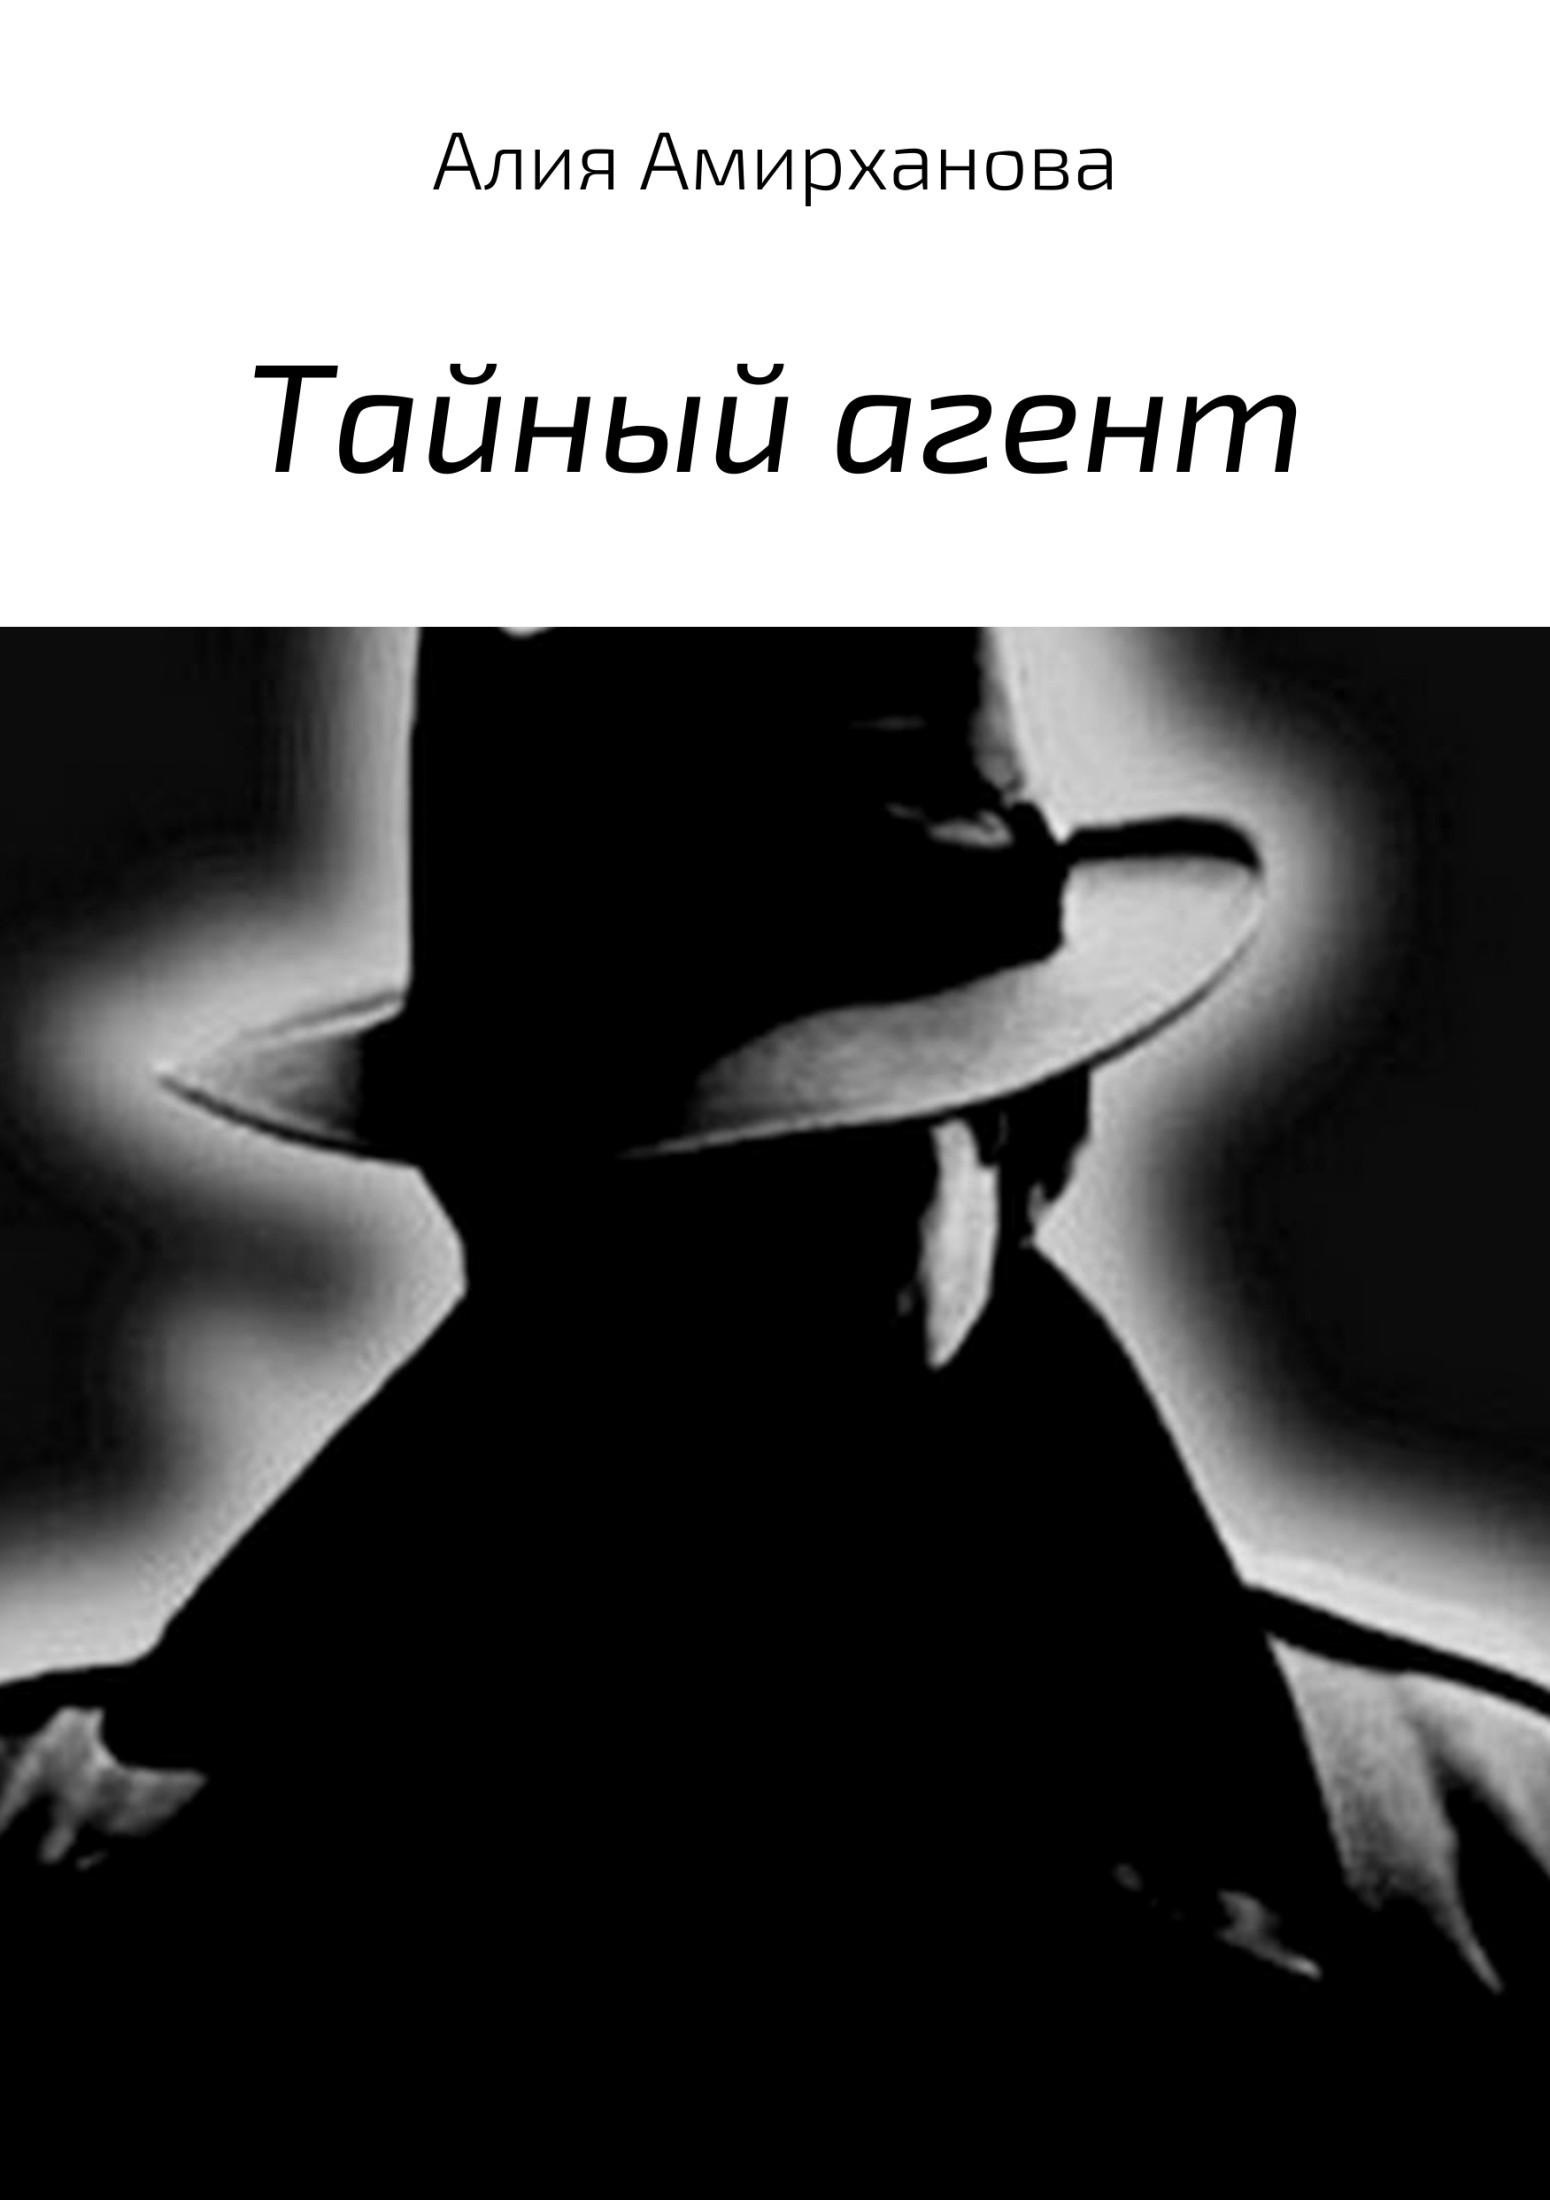 Алия Амирханова Тайный агент алия амирханова эксперимент